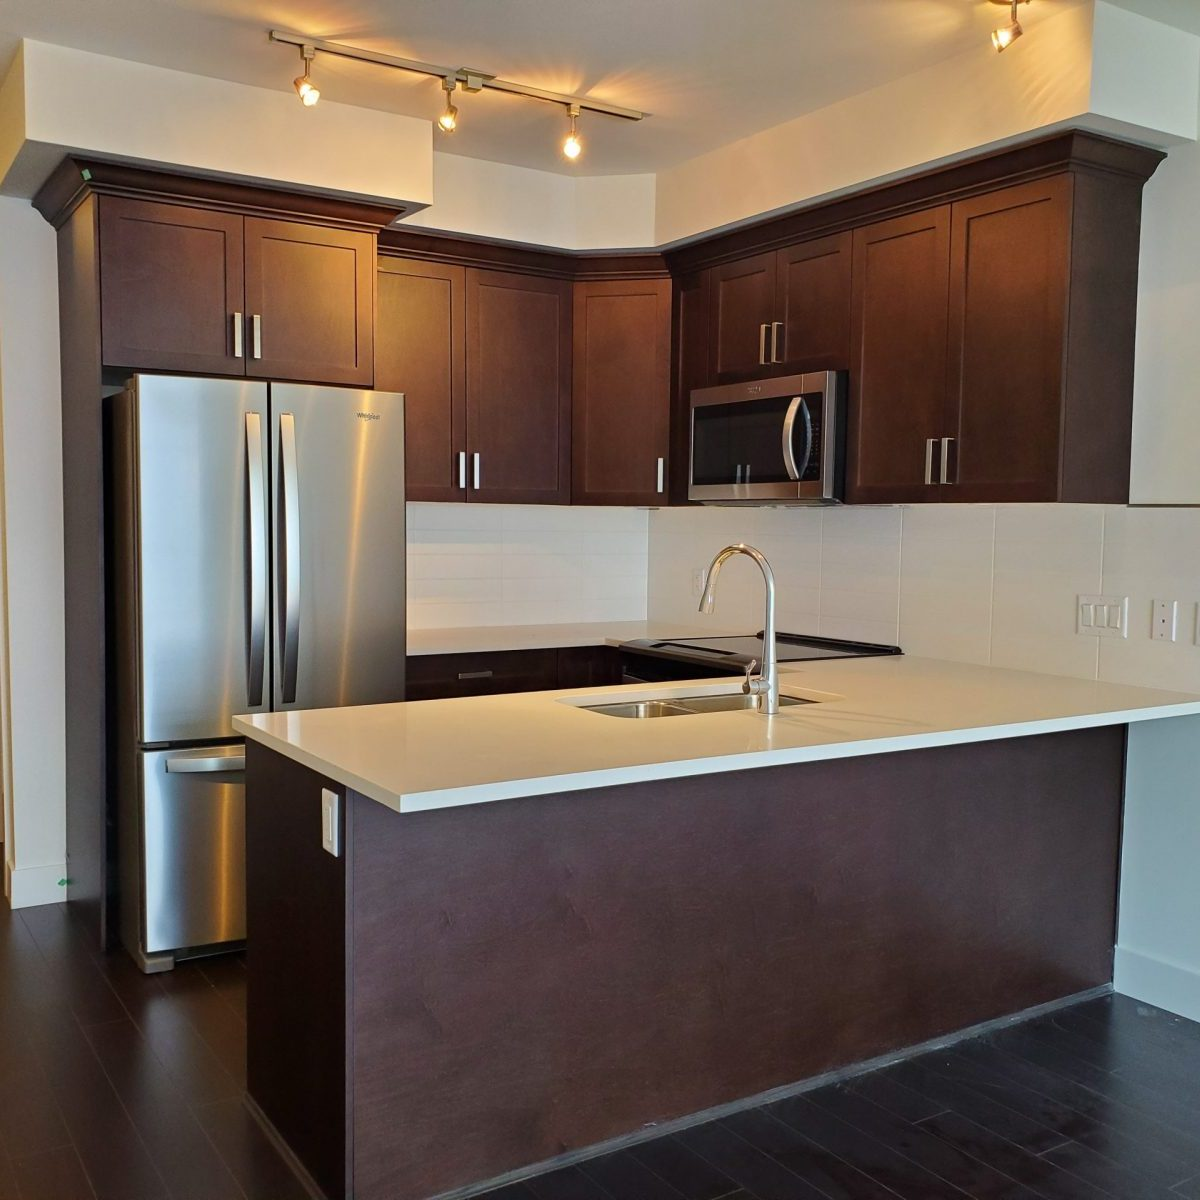 Lumiere kitchen cabinets